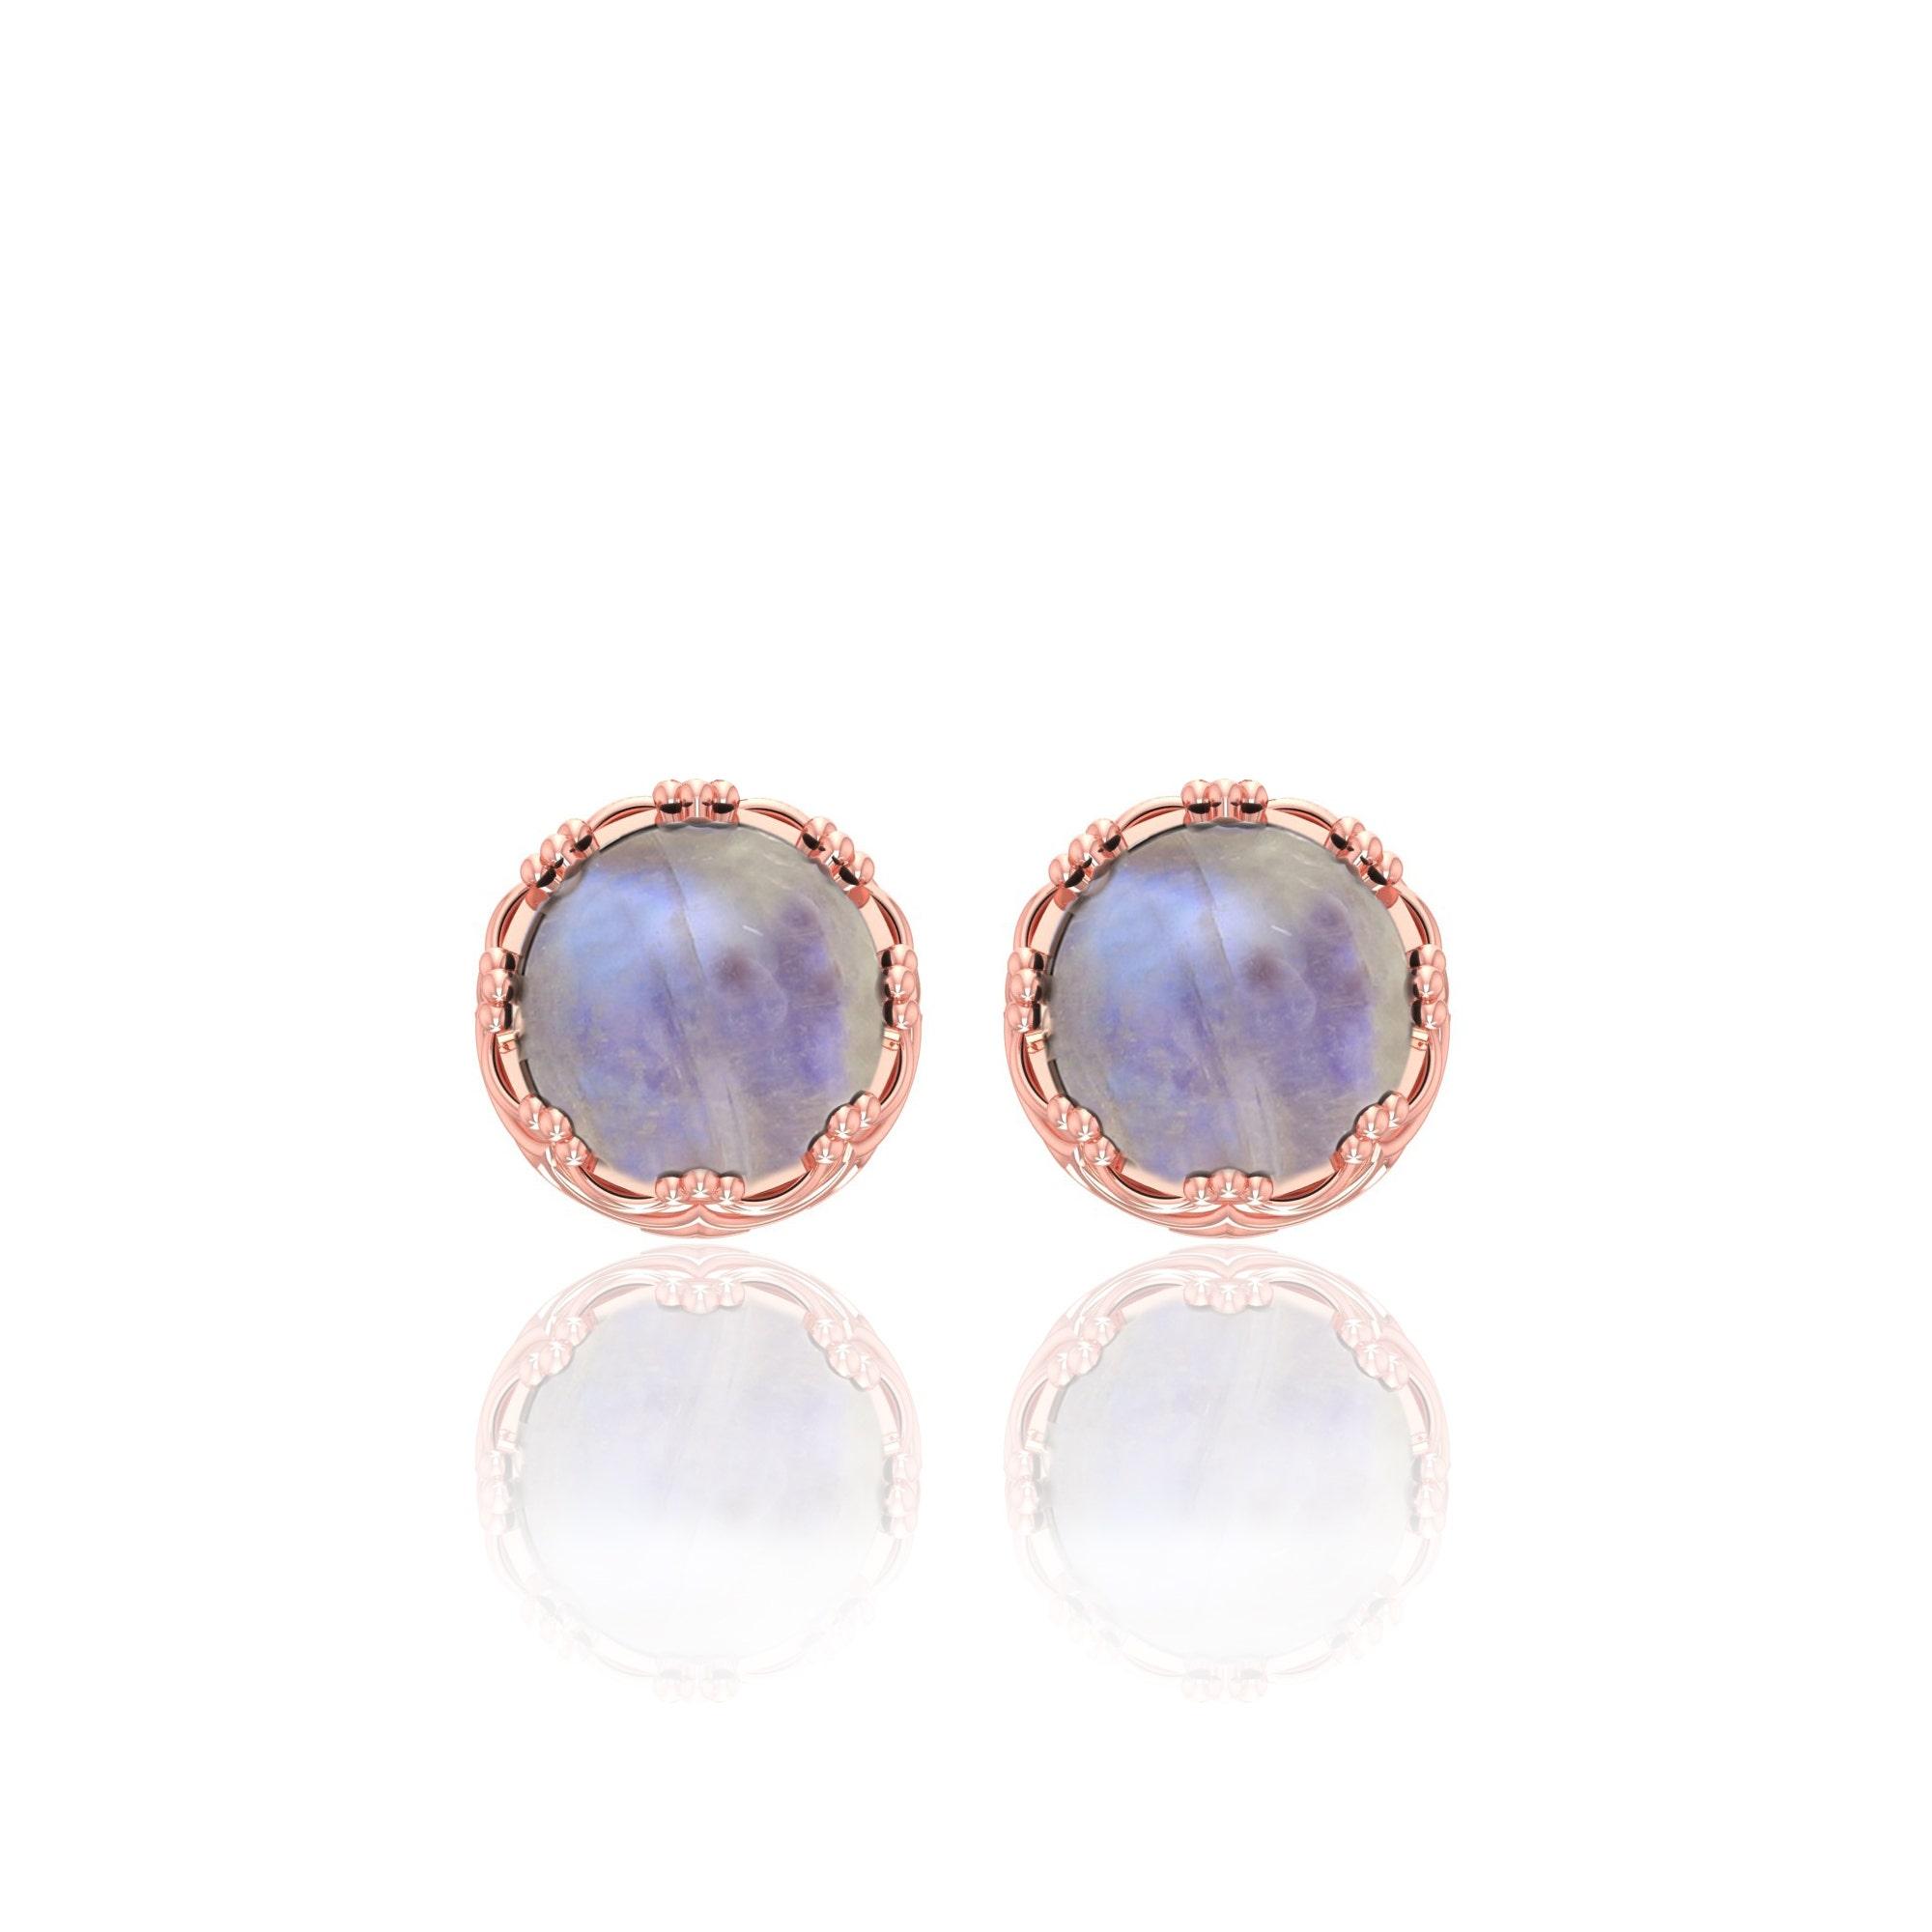 Moonstone Gemstone Earring